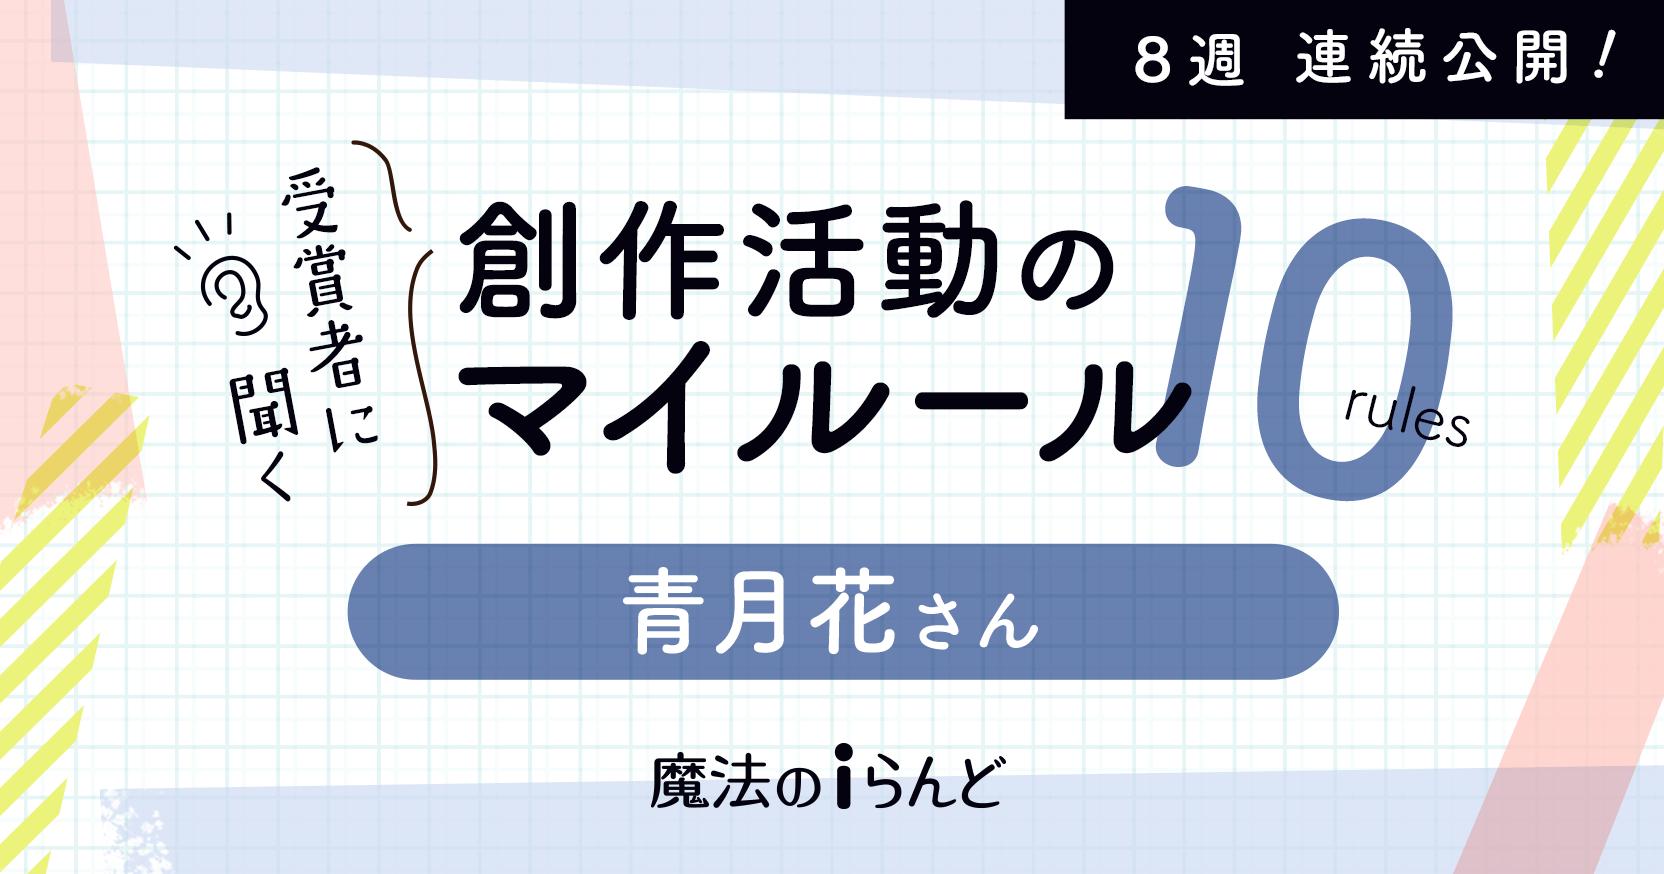 https://storage.googleapis.com/blog-info/entry/2021/08/07-myrule-aotsuki_ogp.png